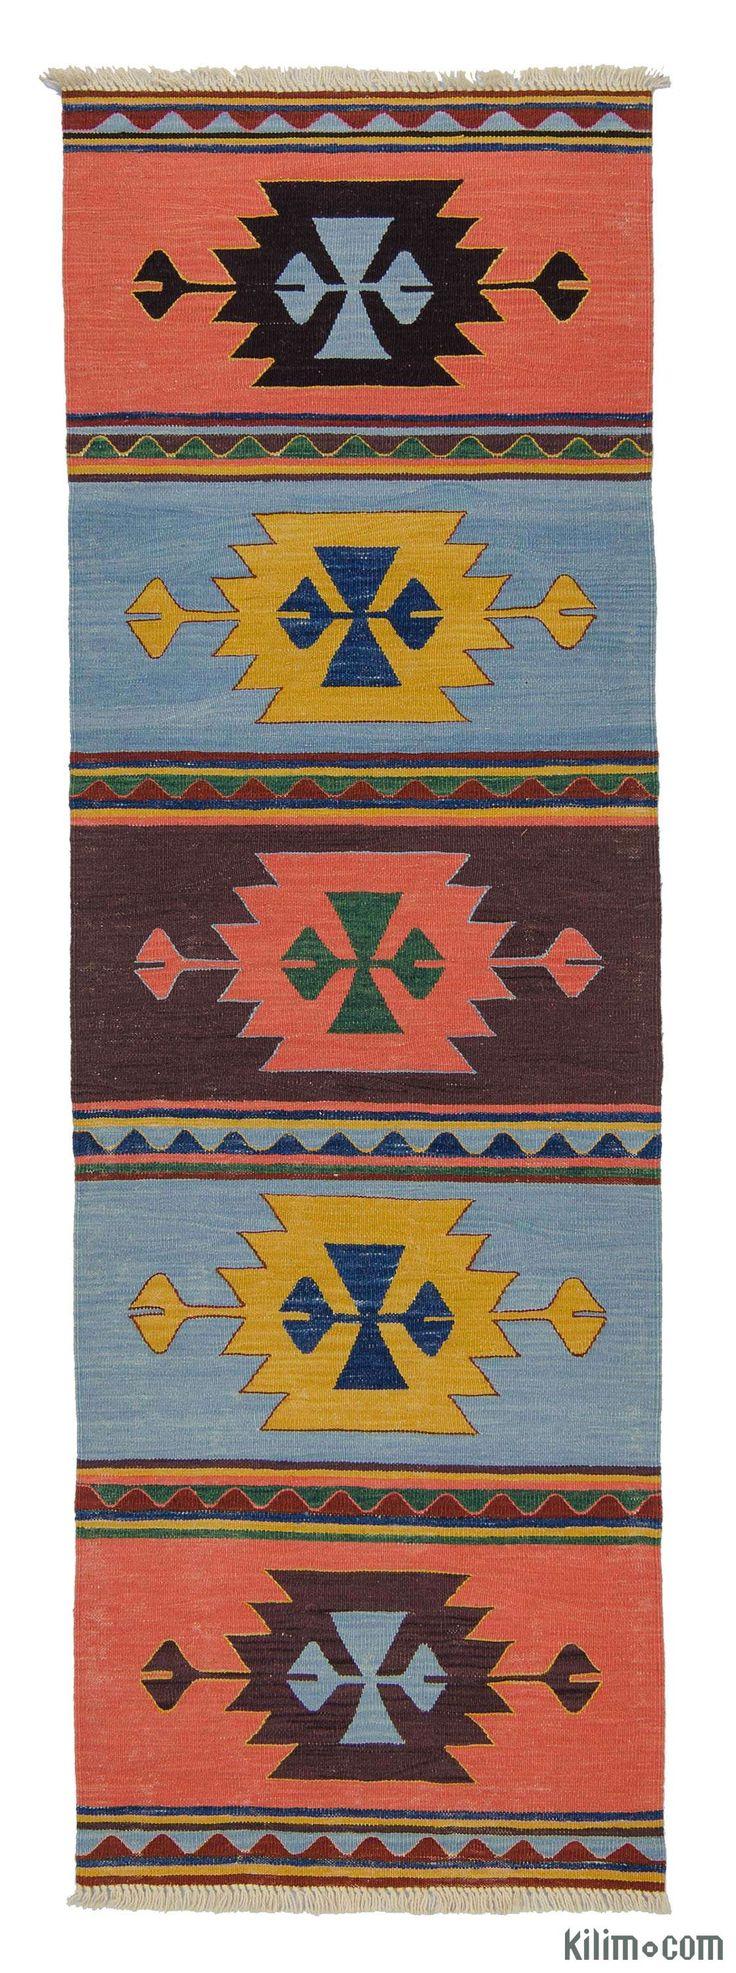 K0007972 New Turkish Kilim Runner | Kilim Rugs, Overdyed Vintage Rugs, Hand-made Turkish Rugs, Patchwork Carpets by Kilim.com